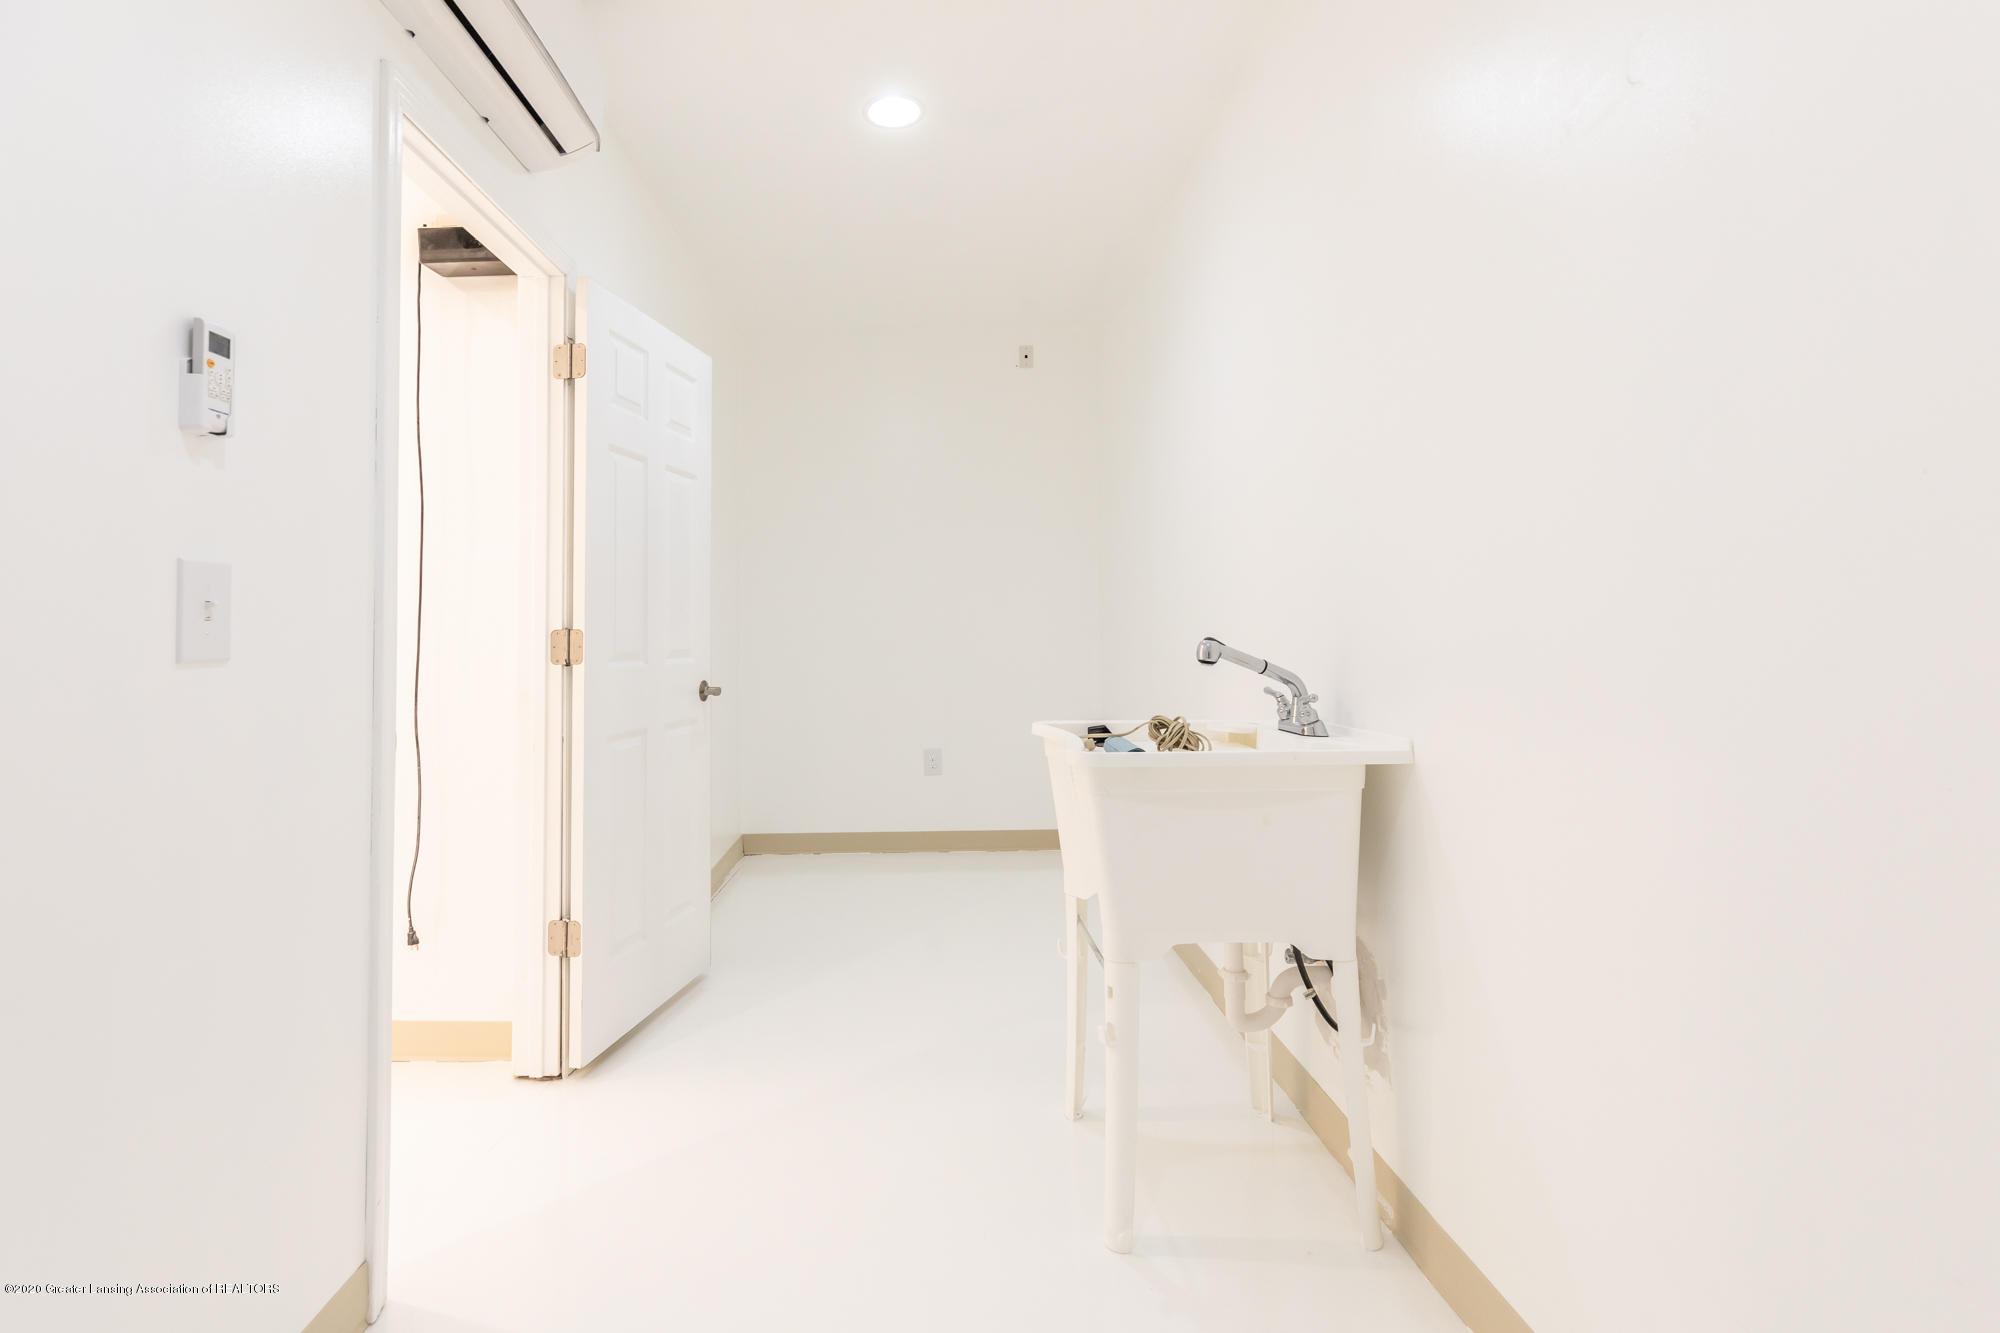 4020 Hagadorn Rd - Humidor Room - 42